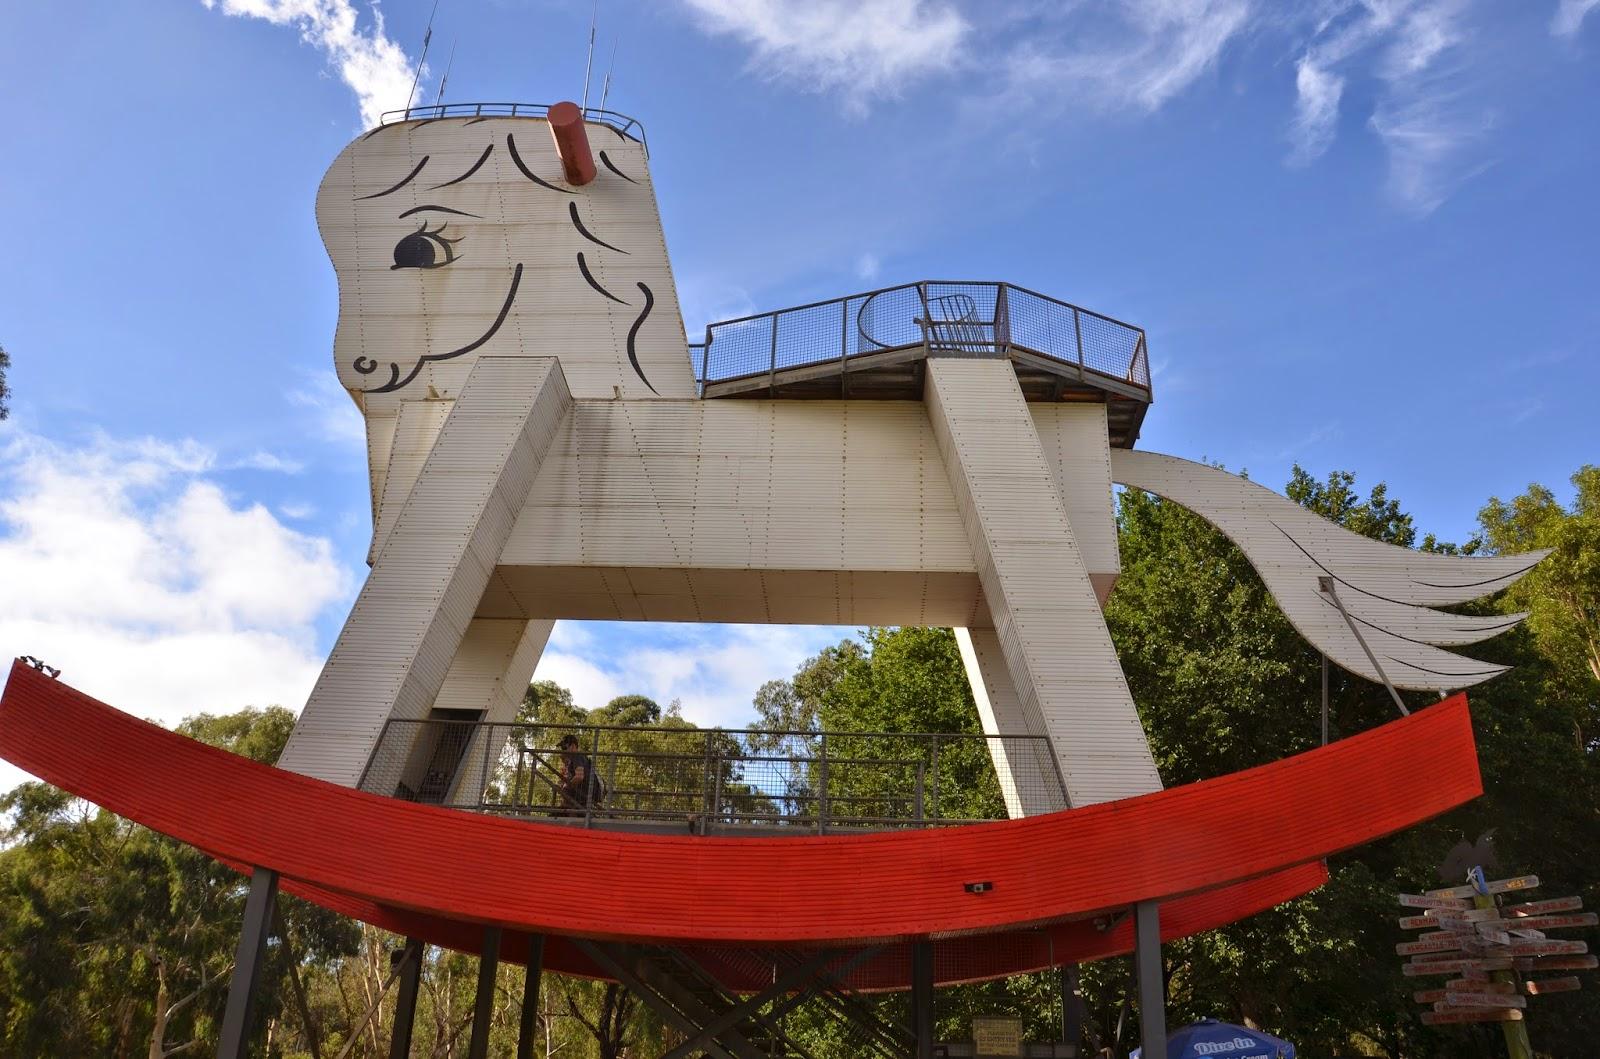 The Big Rocking Horse A South Australian Icon Teacher